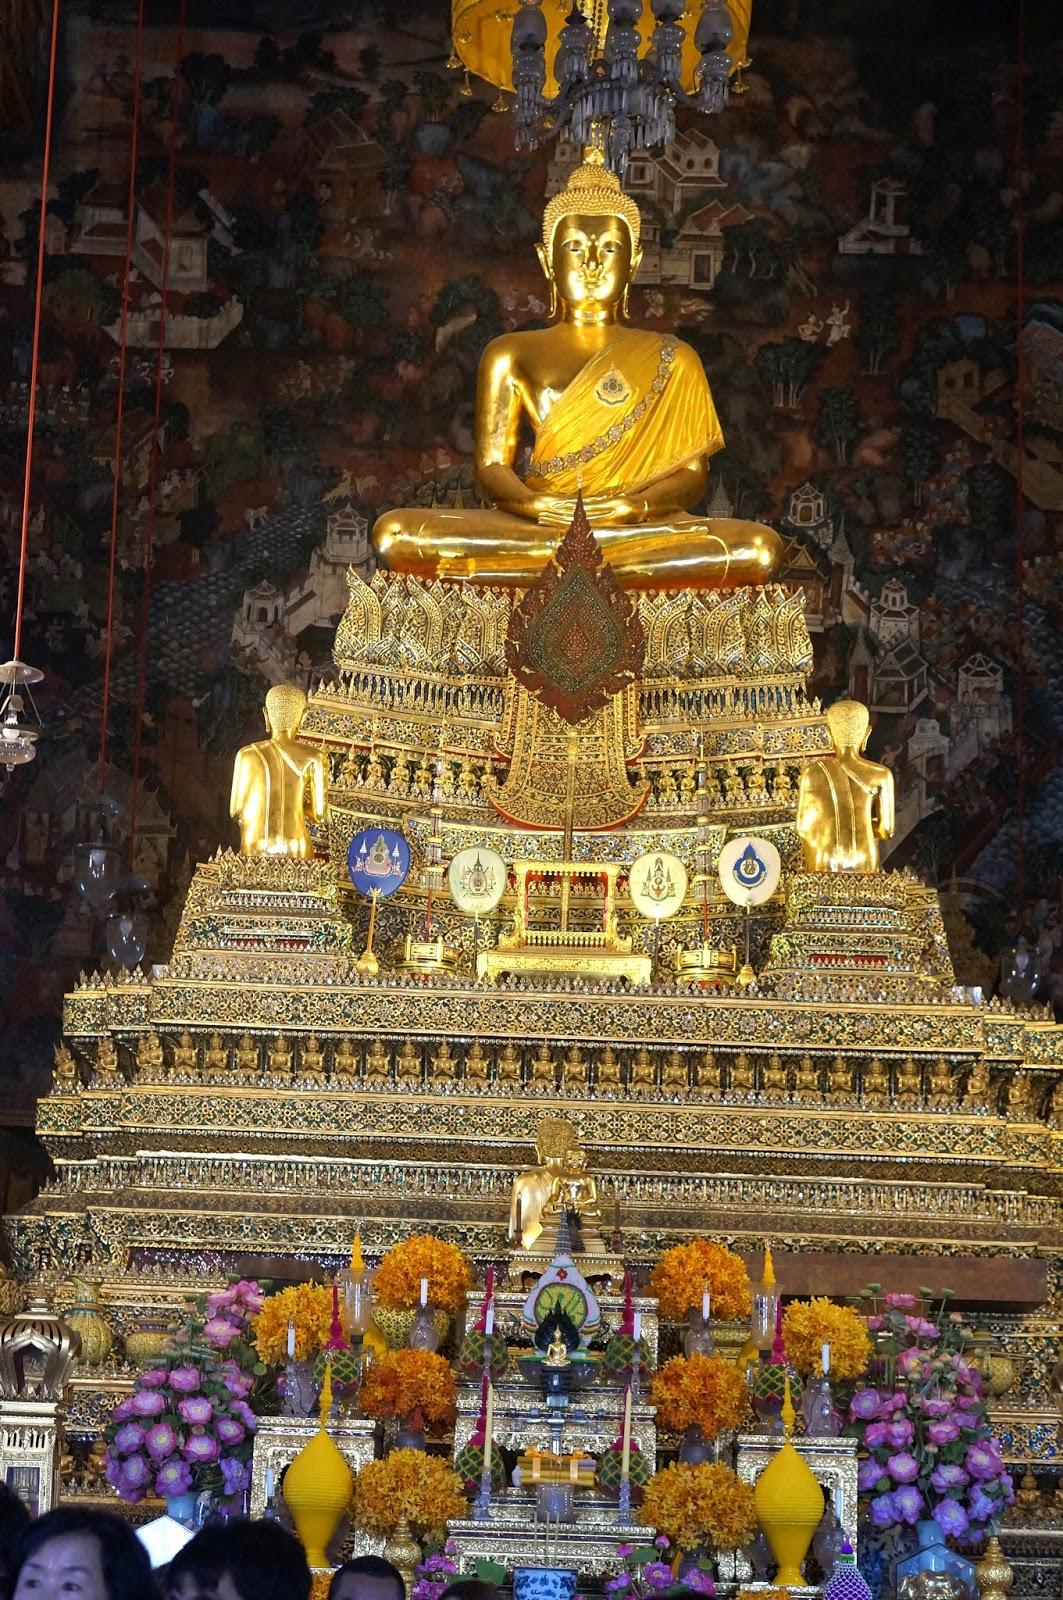 Phra Ubusot & Walk with Cham: Wat Pho Bangkok Thailand islam-shia.org